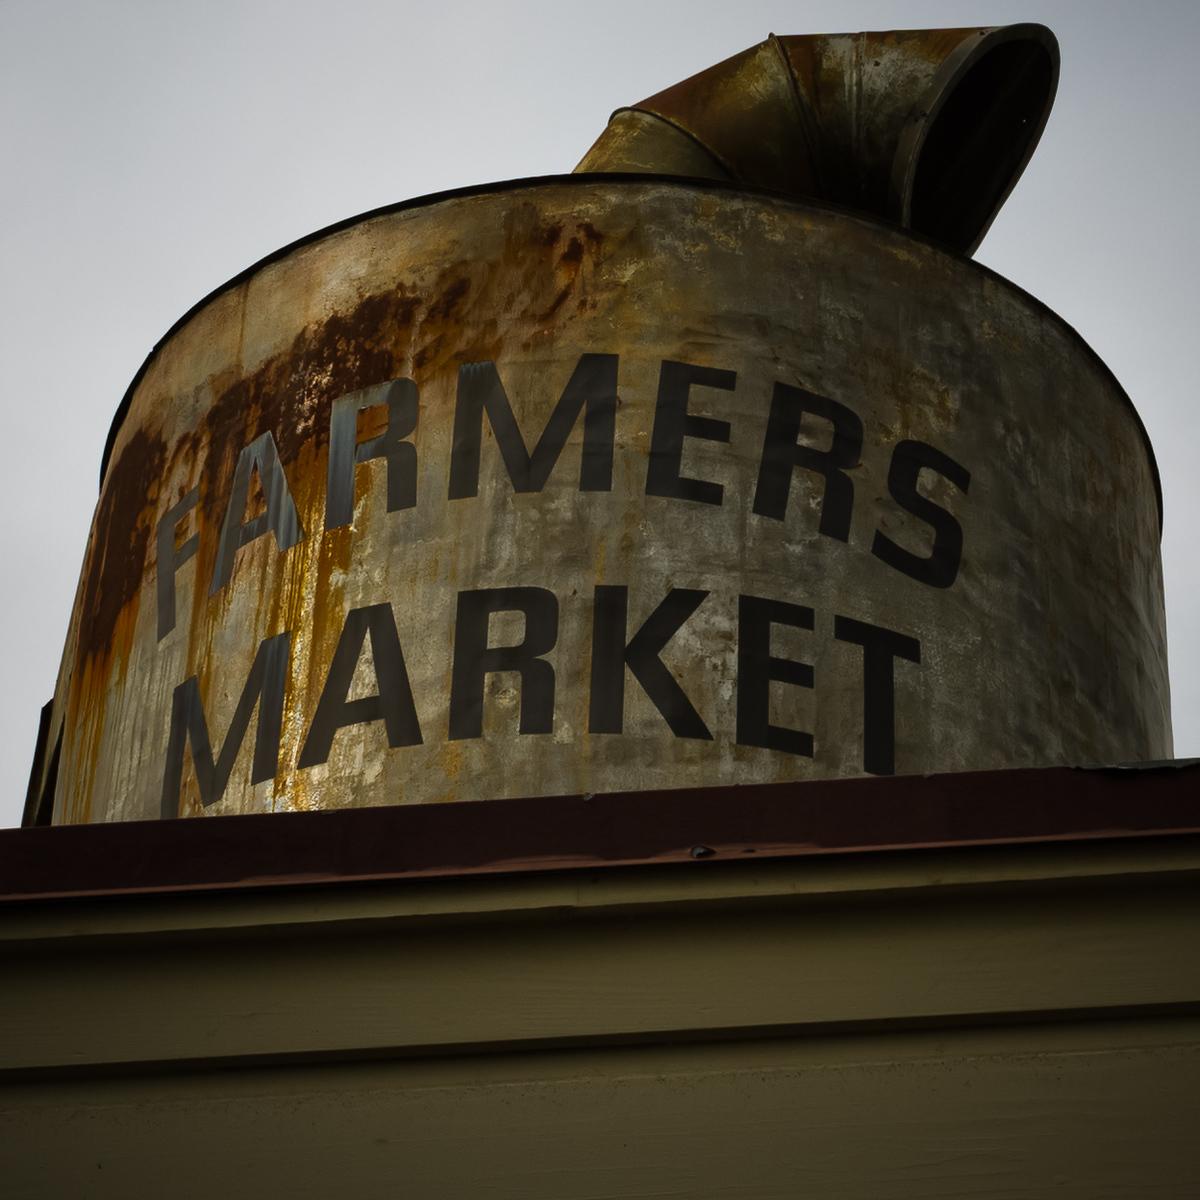 Los Angeles, California, United States, Farmers Market